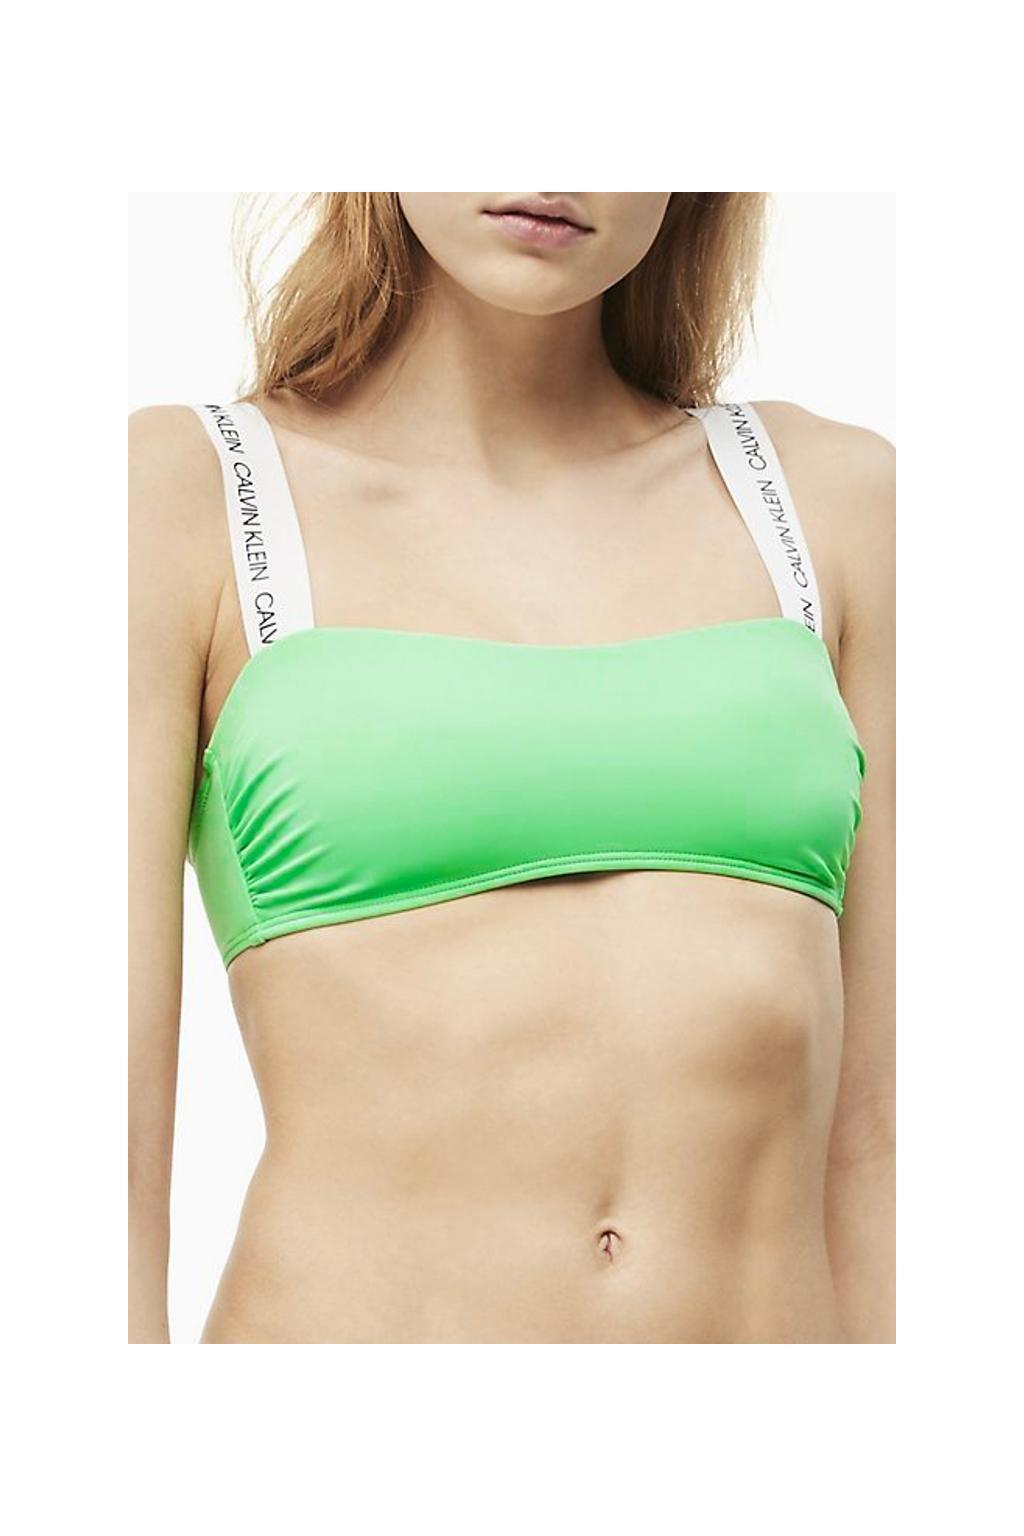 Calvin Klein bandeau plavky vrchní díl - spring green